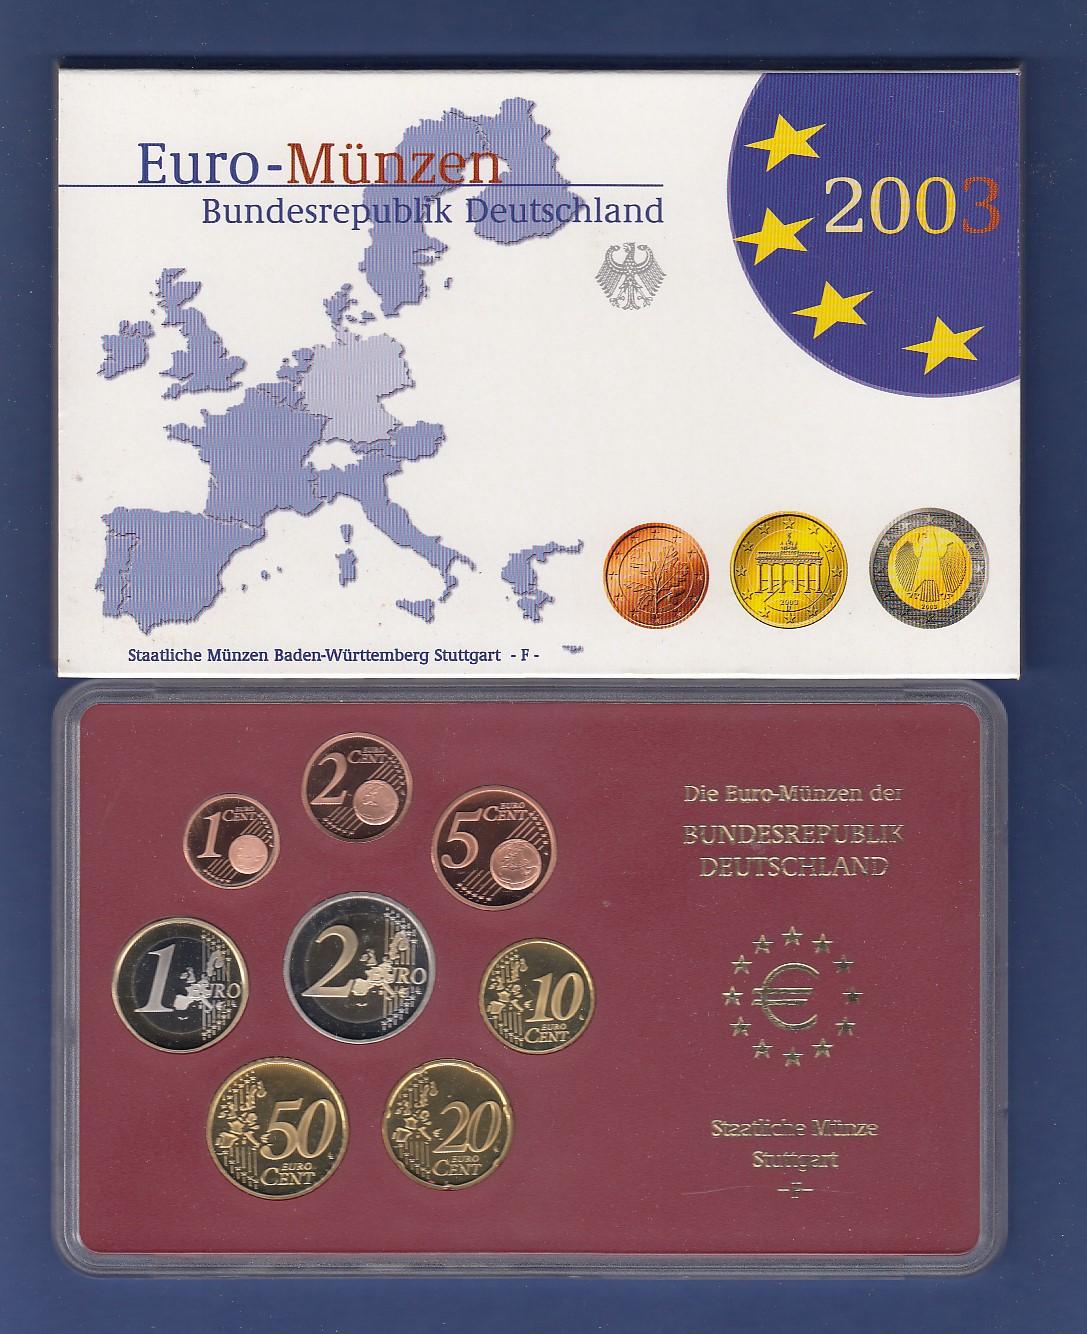 Münzen Edelmetalle Marktplatz Philatelie